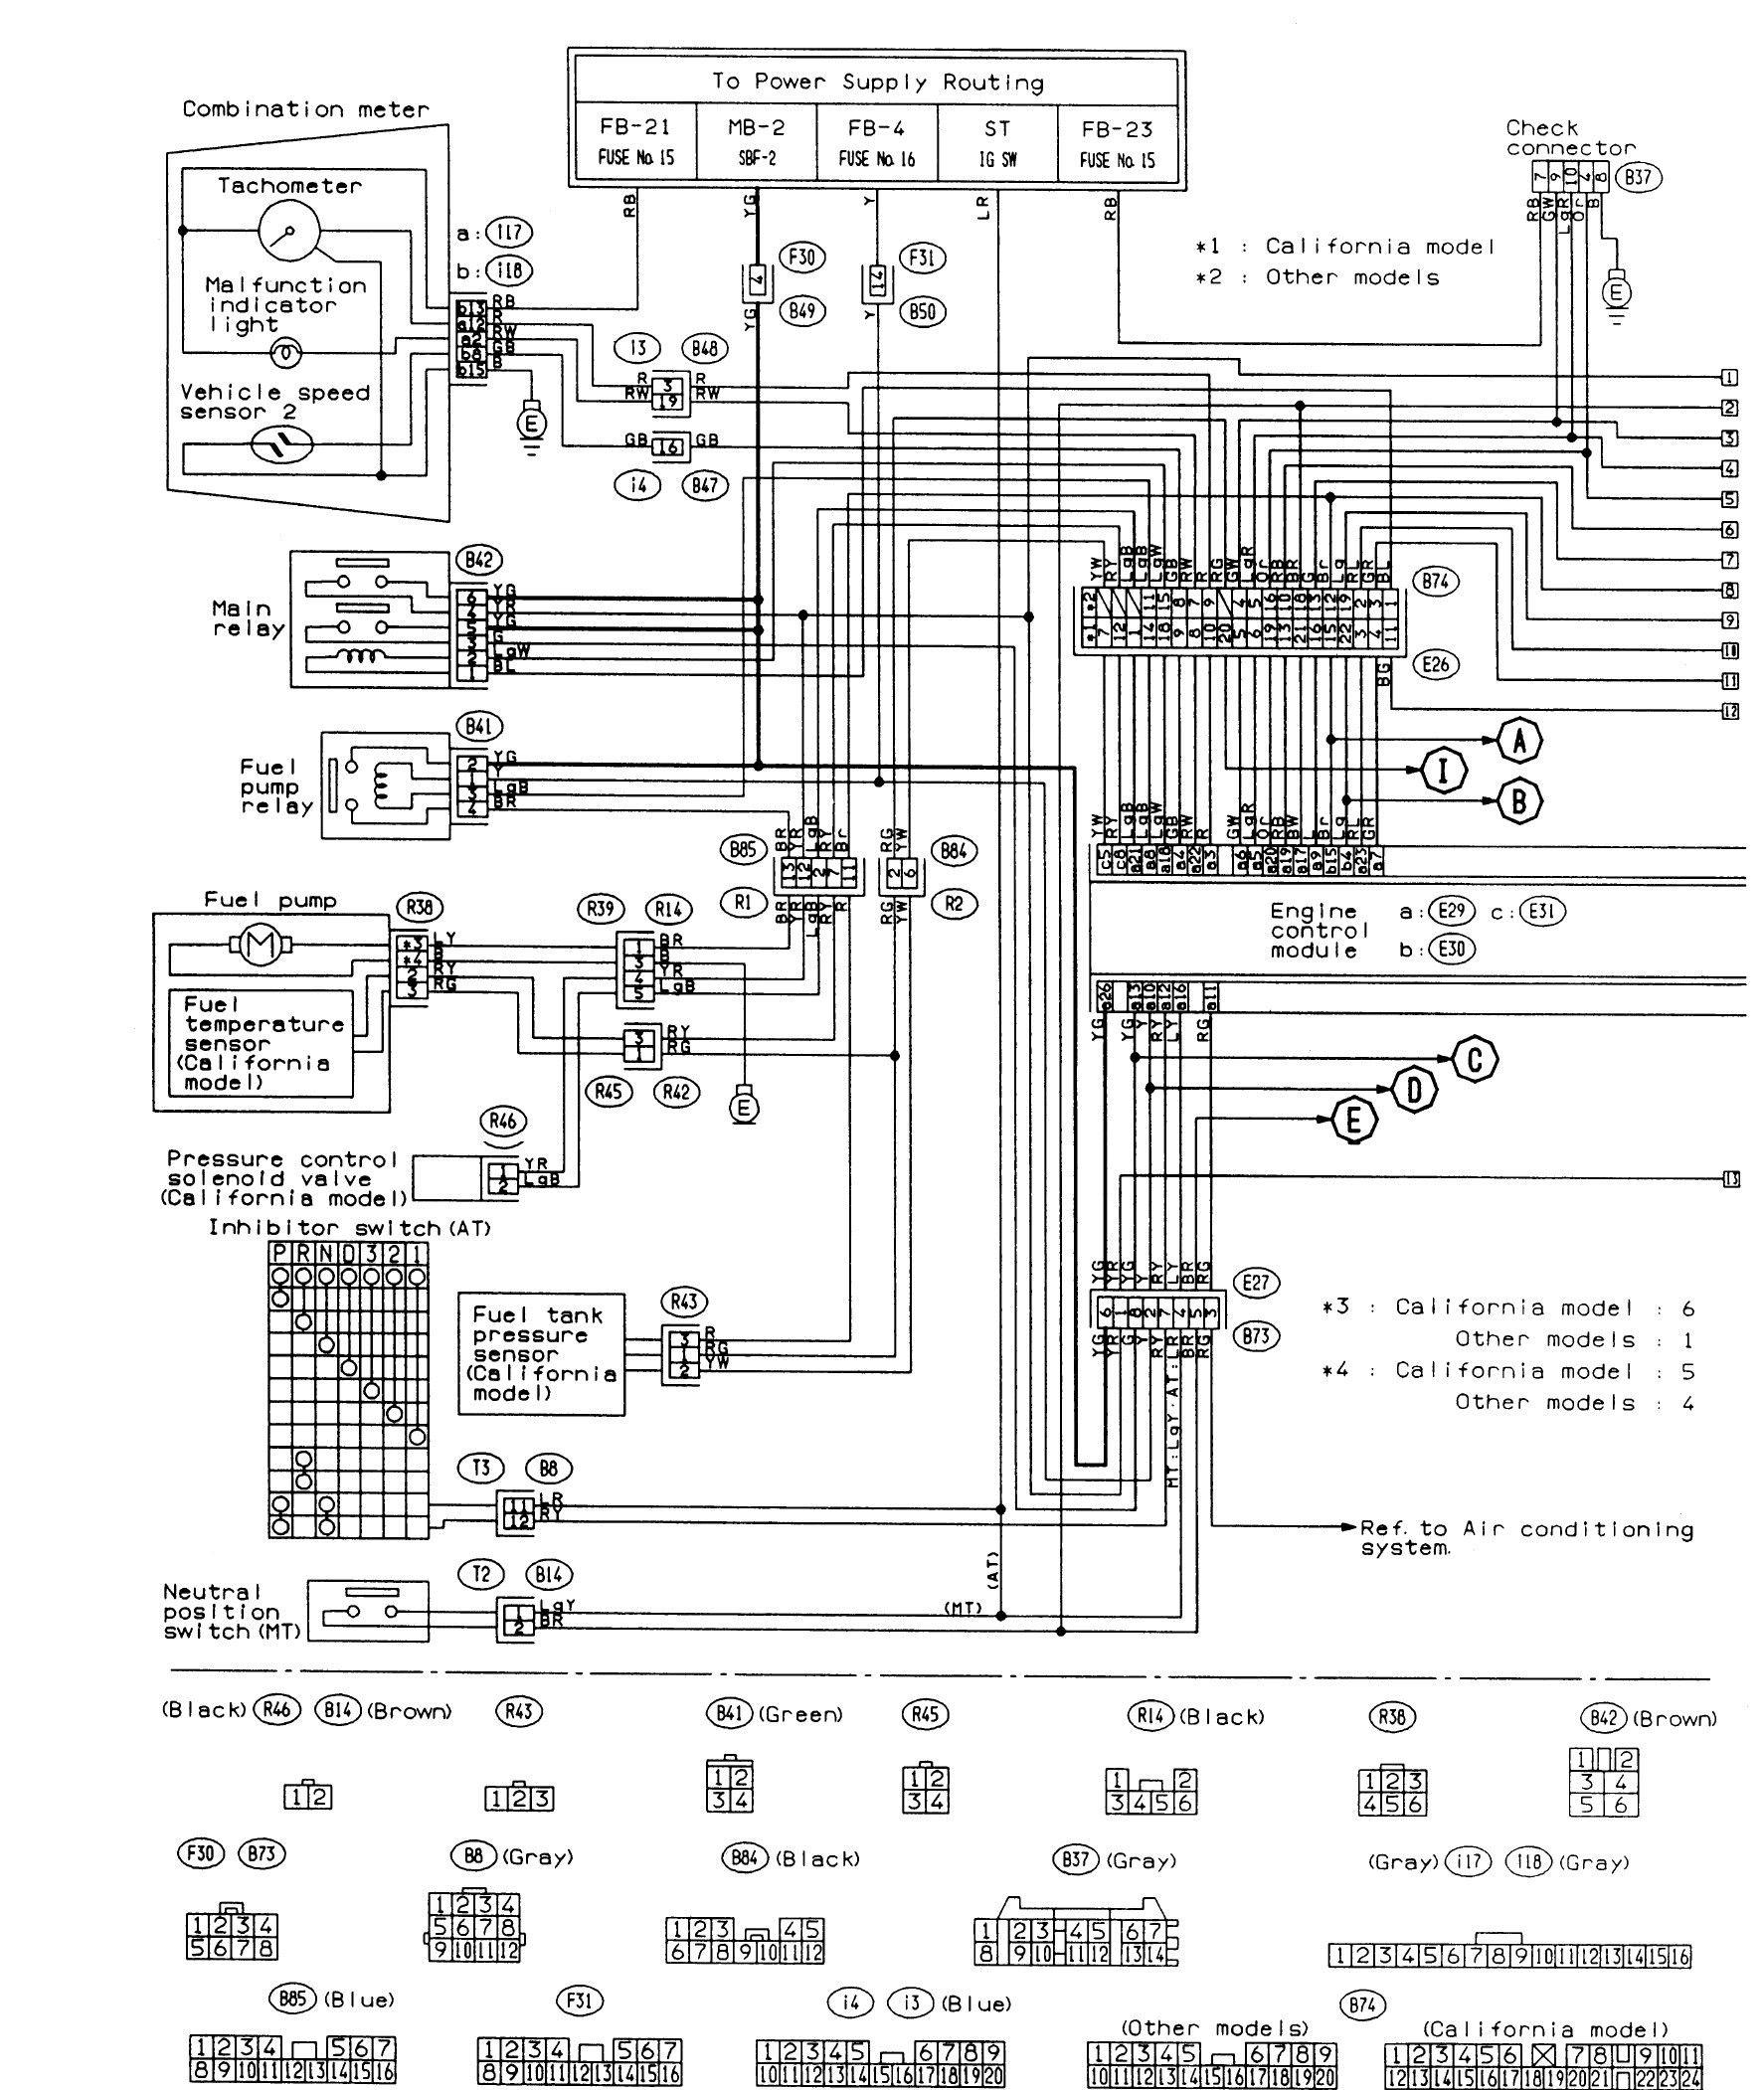 hight resolution of subaru wiring diagram color codes